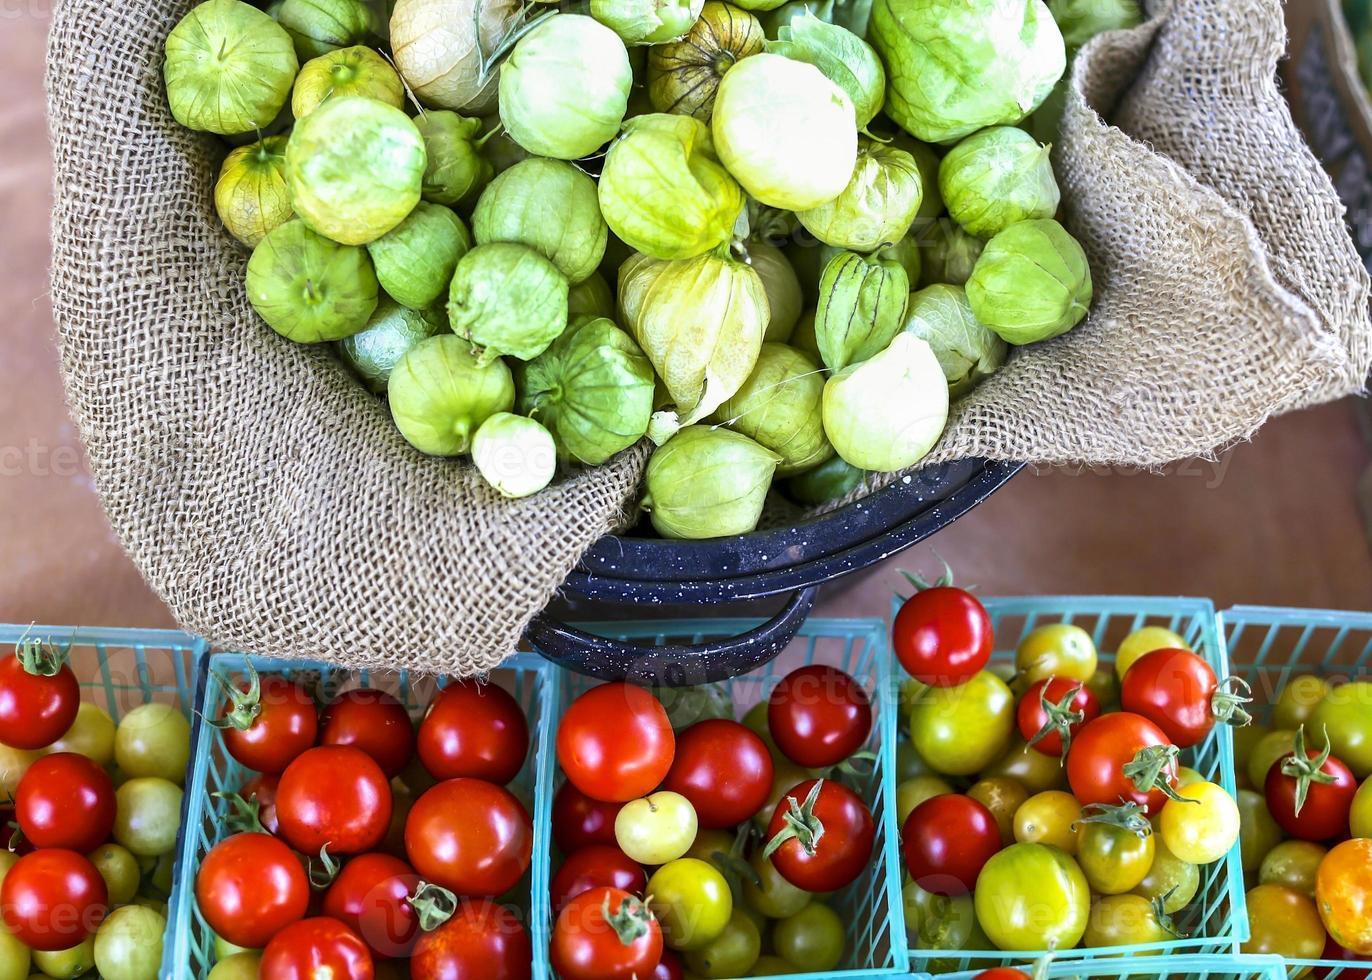 tomatillos_and_tomatoes foto